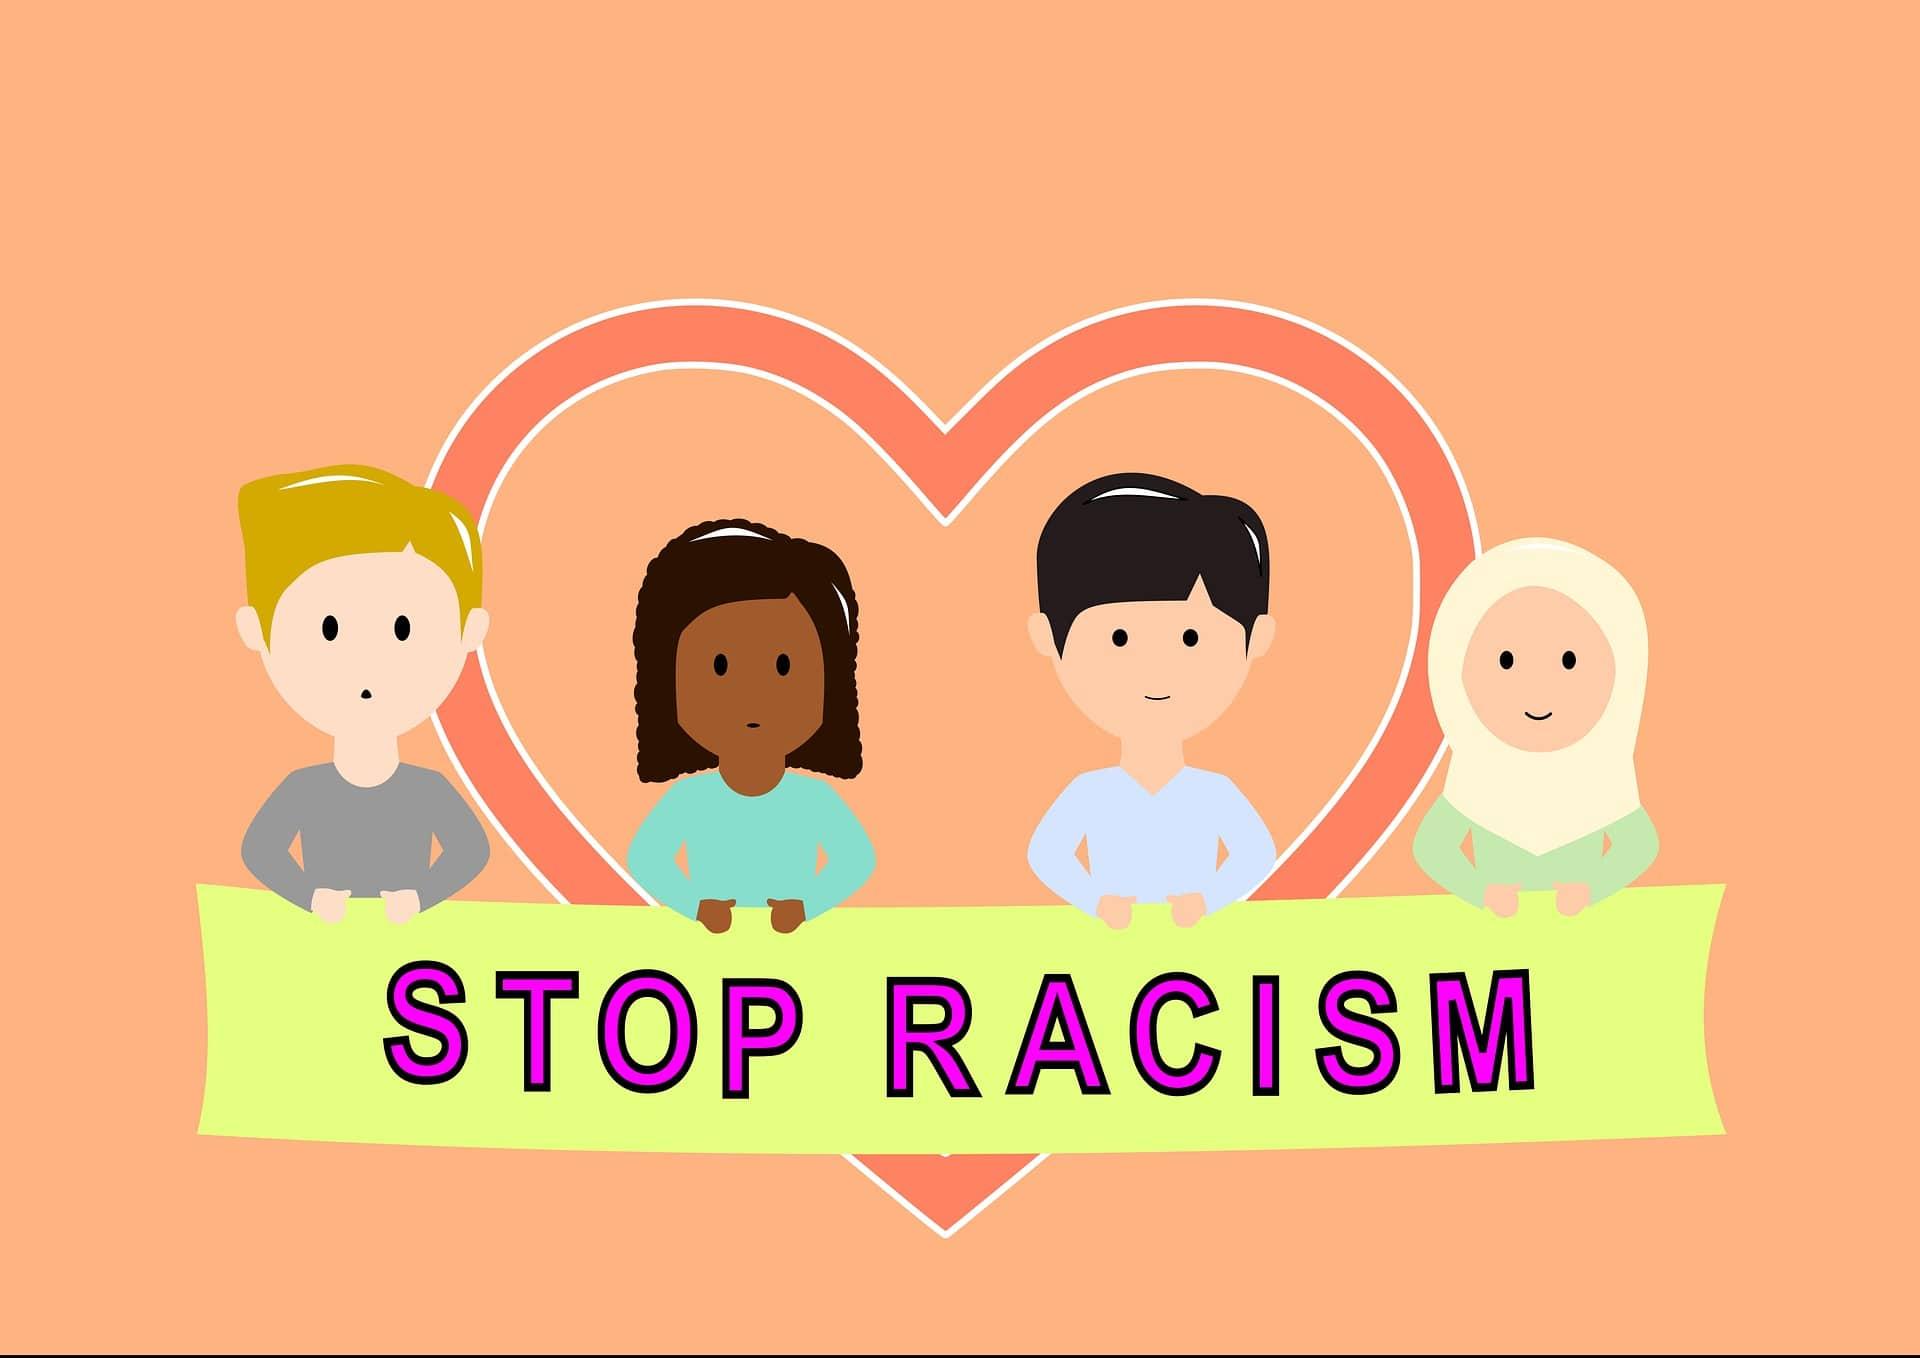 Shrewsbury lie detector, Shrewsbury lie detector test, West Midlands polygraph examiner, racism